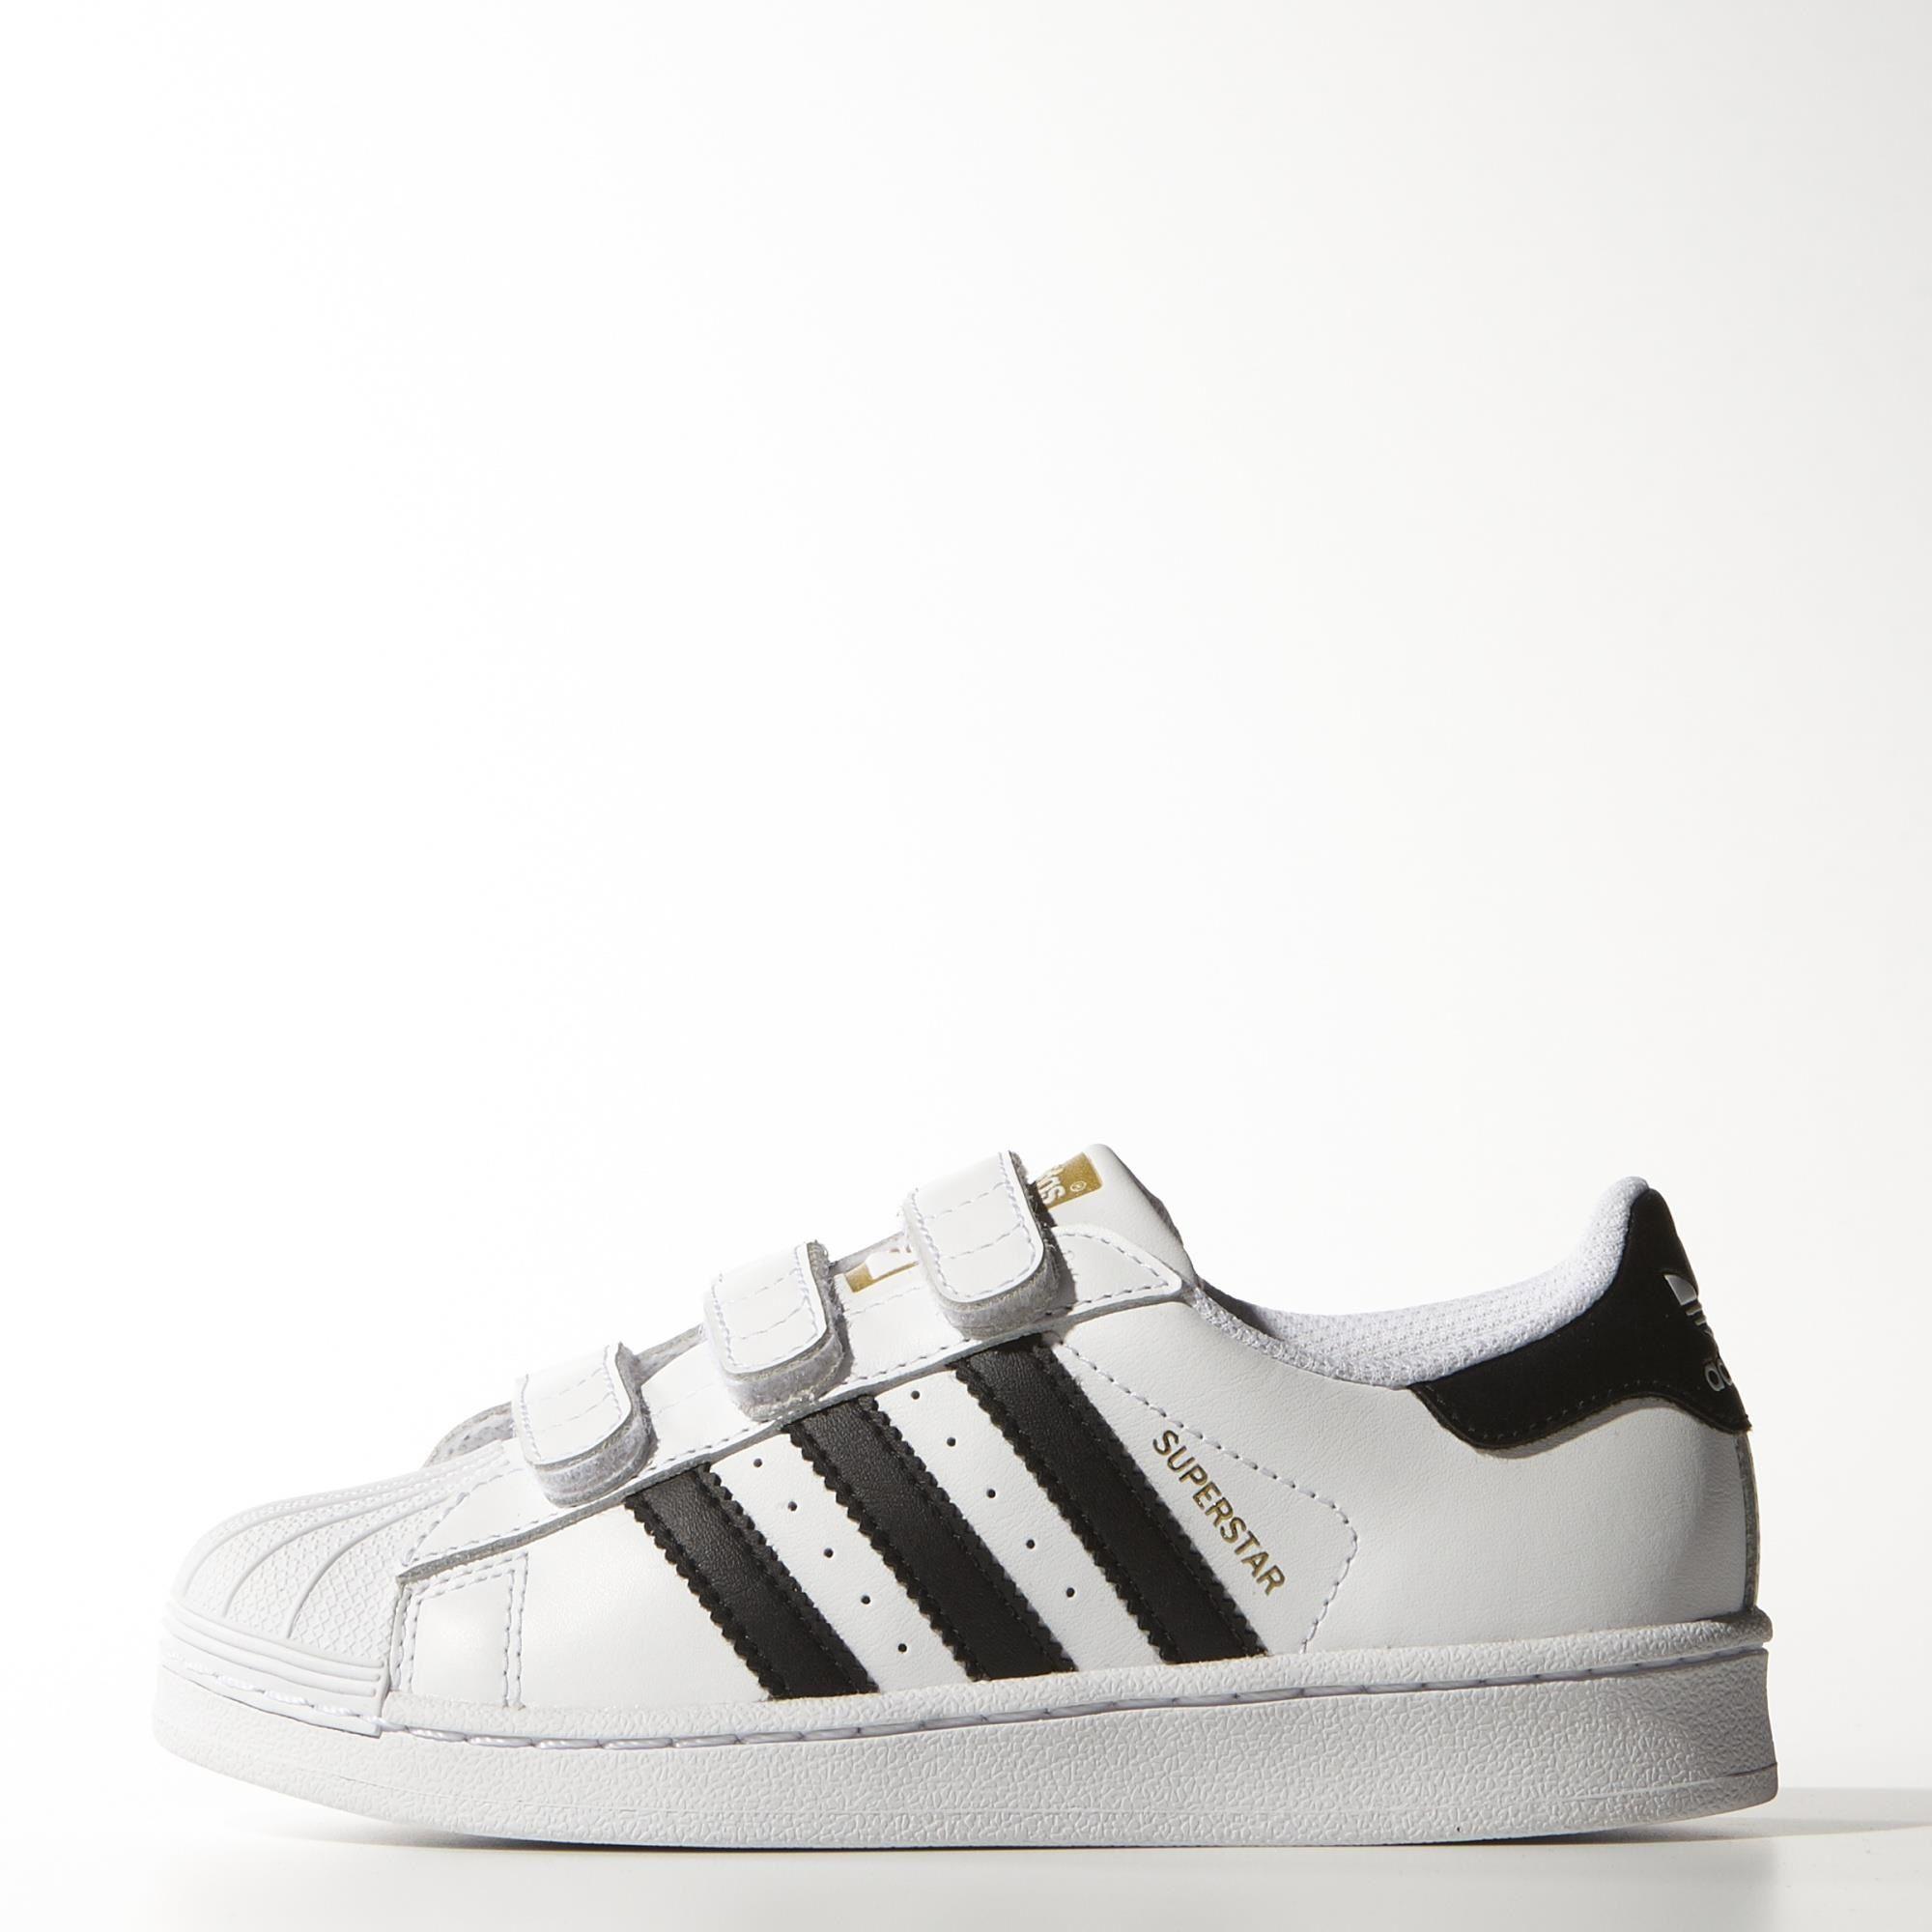 adidas originals superstar primeknit kinder schwarze billige > off58%